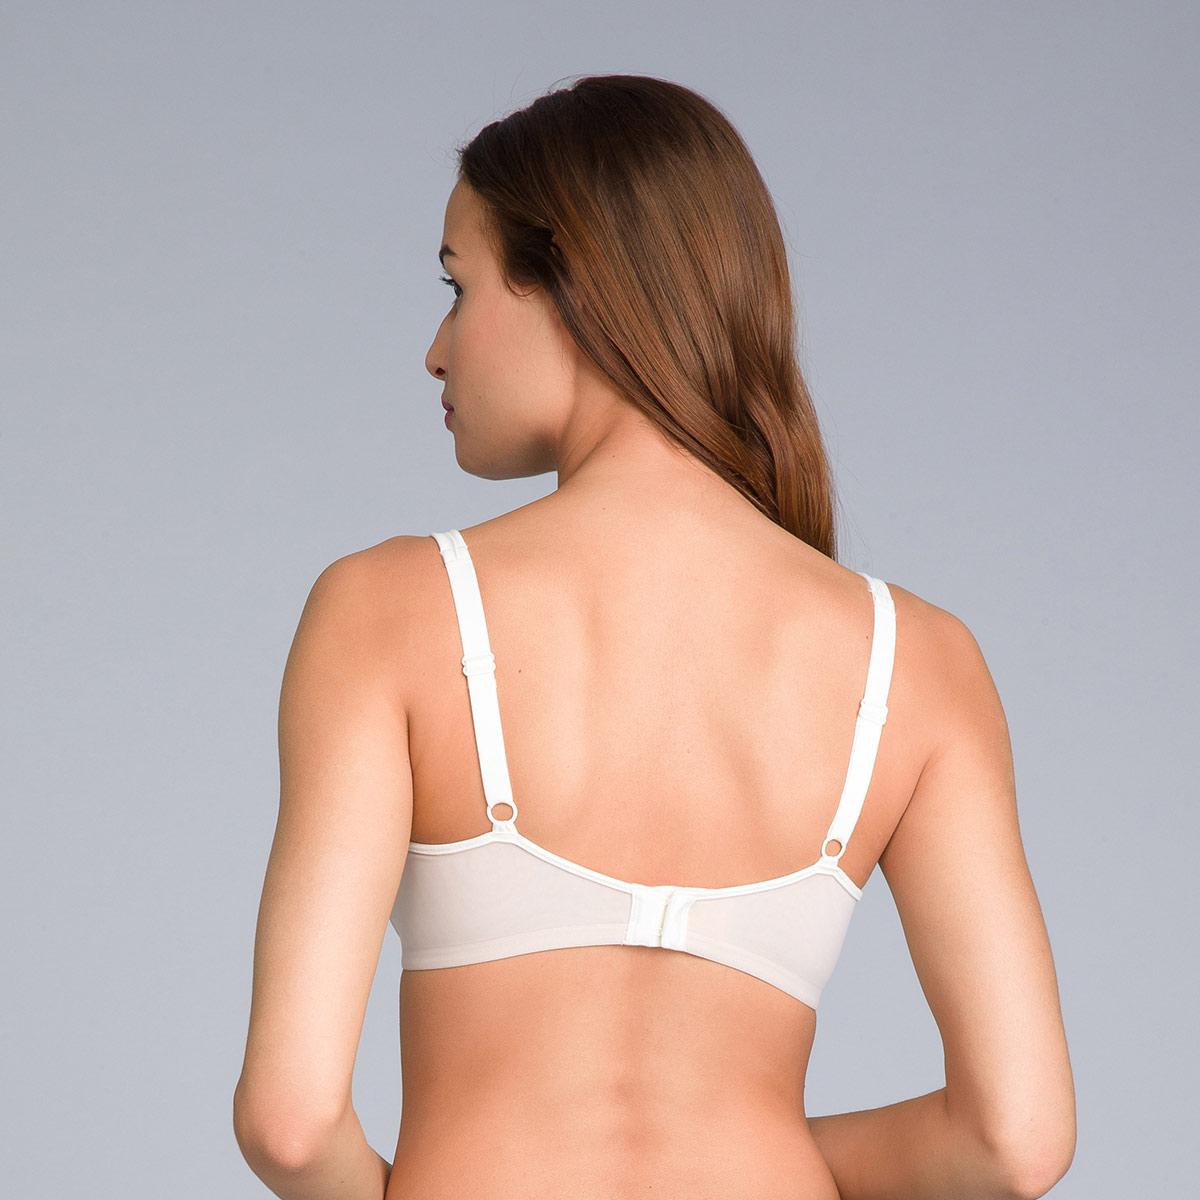 Soutien-gorge minimiseur couleur beige Expert in Silhouette, , PLAYTEX